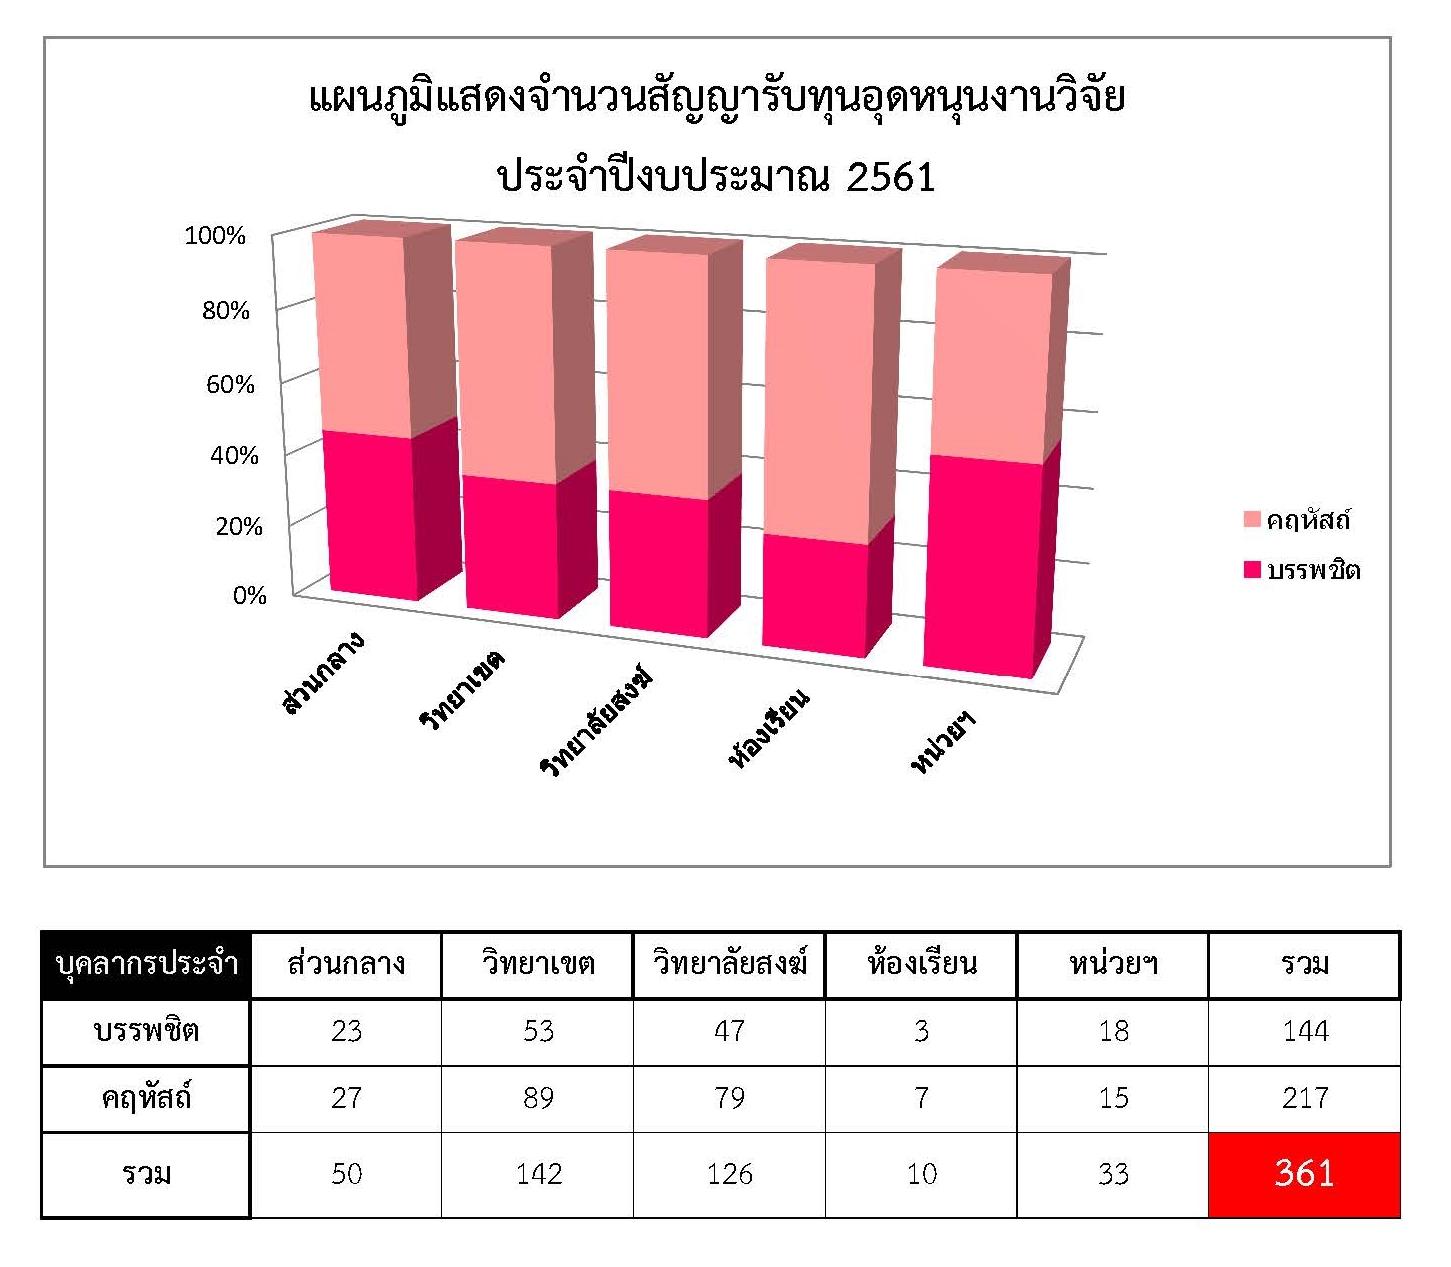 %e0%b8%aa%e0%b8%b1%e0%b8%8d%e0%b8%8d%e0%b8%b2%e0%b8%a3%e0%b8%b1%e0%b8%9a%e0%b8%97%e0%b8%b8%e0%b8%99